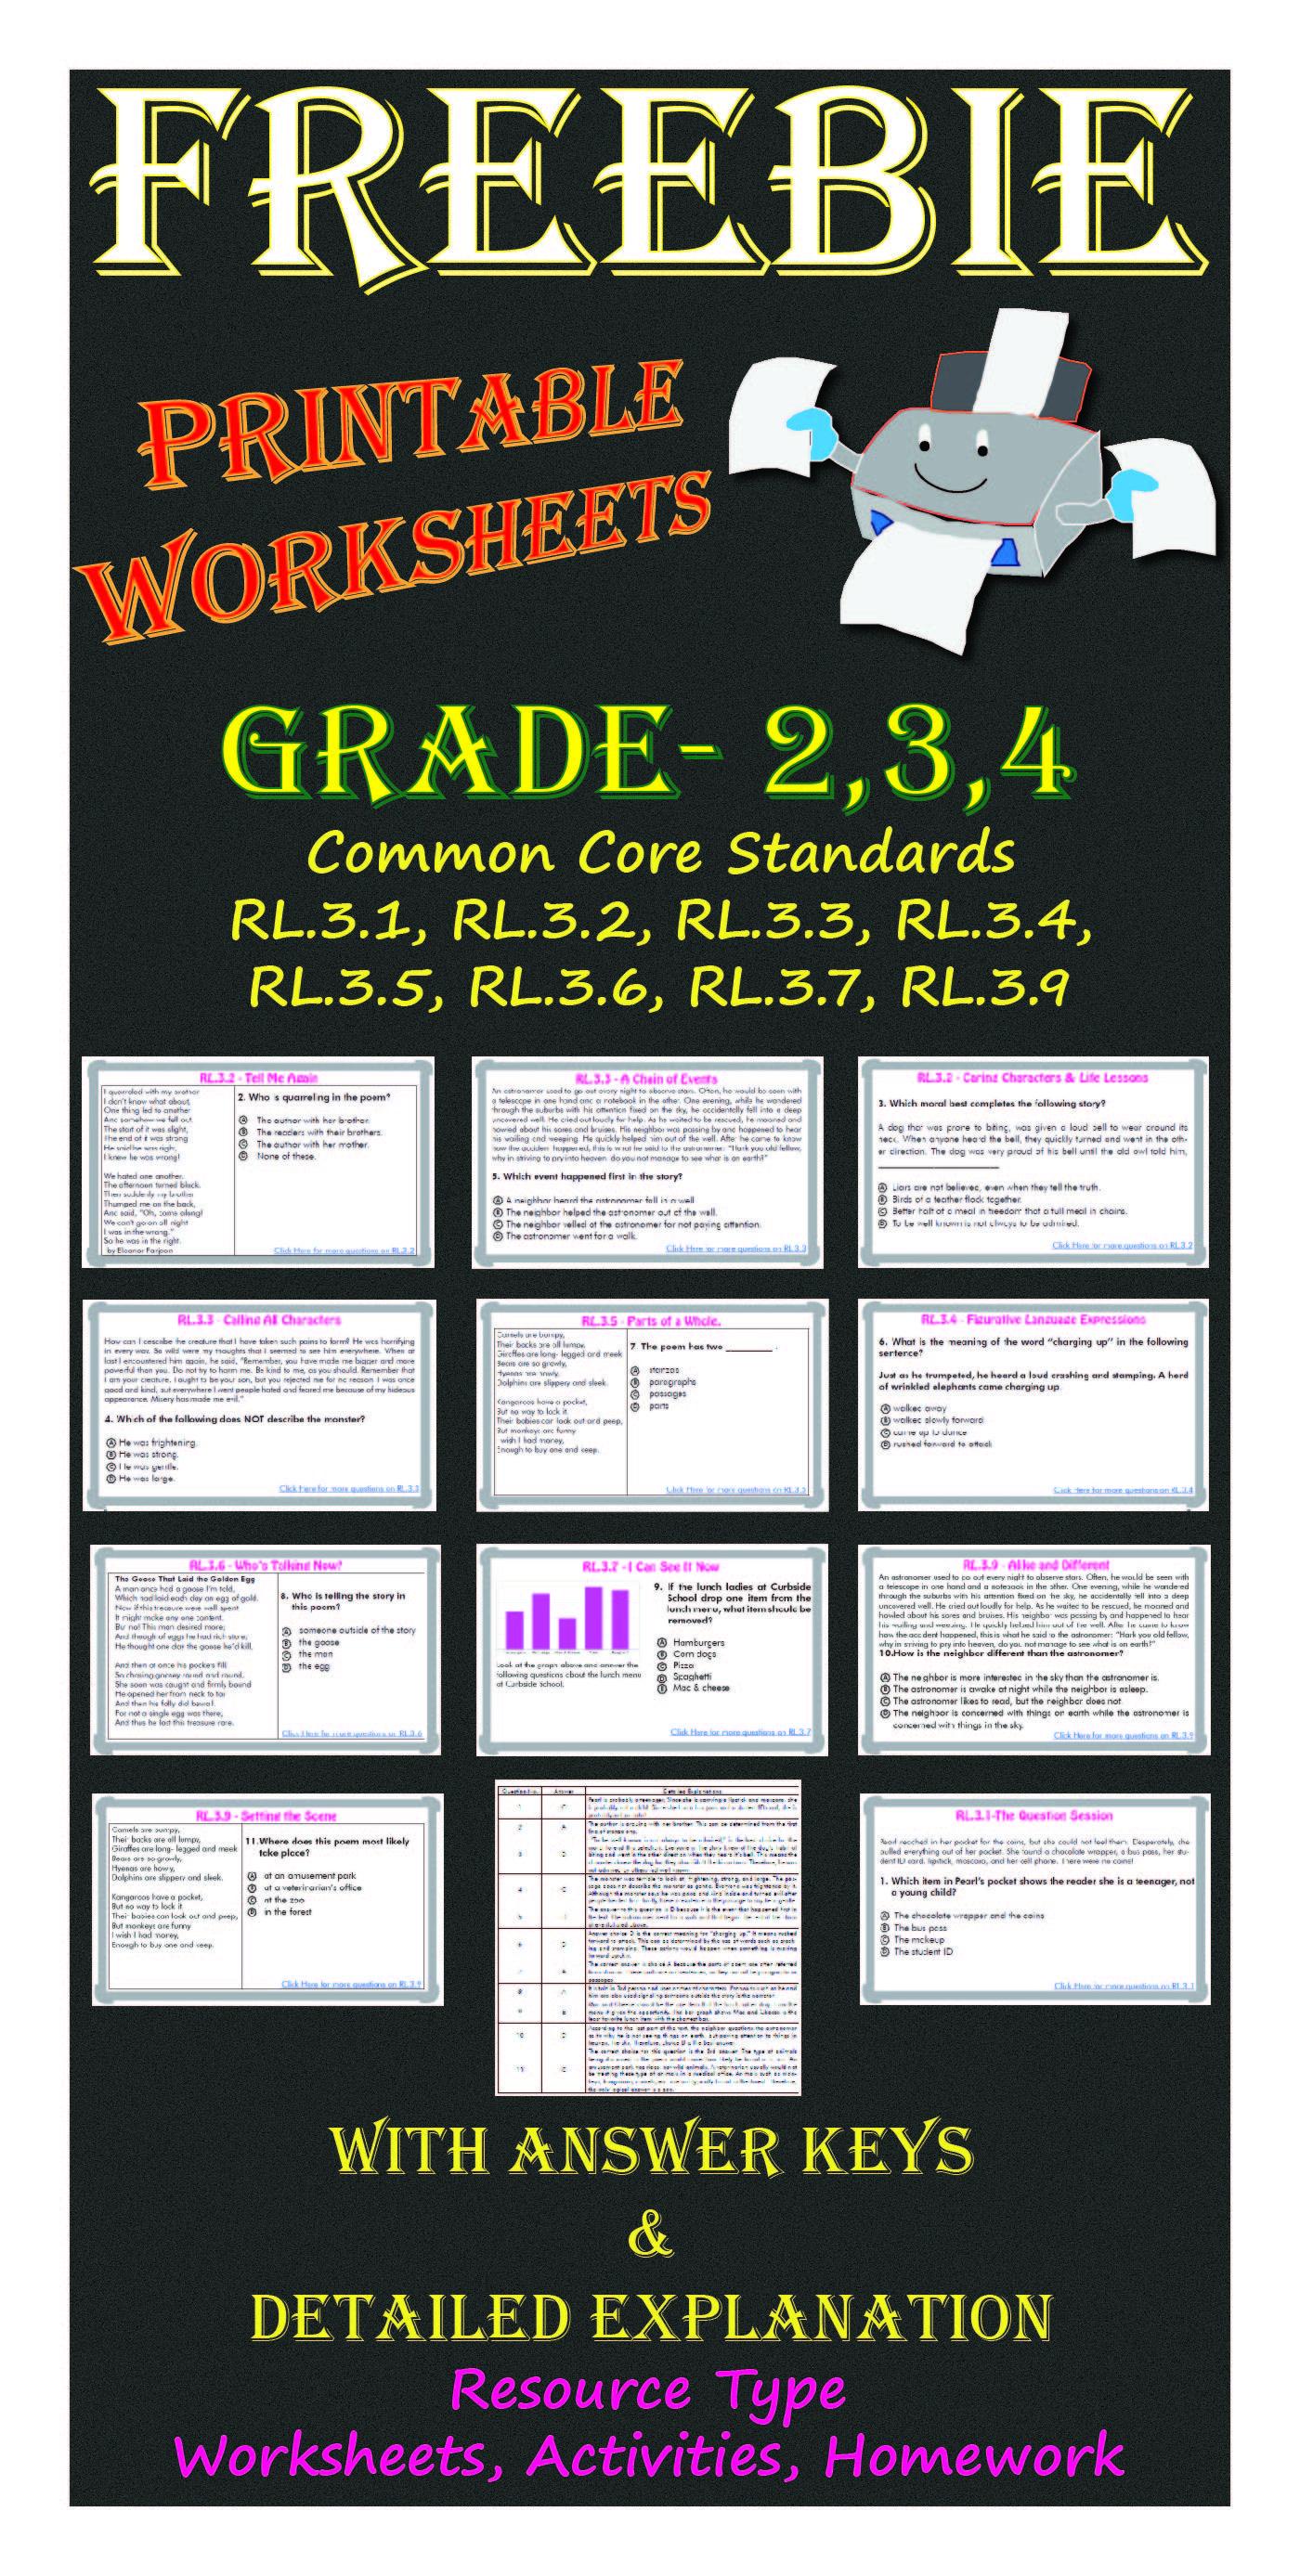 Reading And Language Arts Printable Worksheets Grade 3 Freebie Common Core Standards Rl 3 1 Rl Free Teaching Resources Printable Worksheets Elementary Ela [ 2775 x 1400 Pixel ]